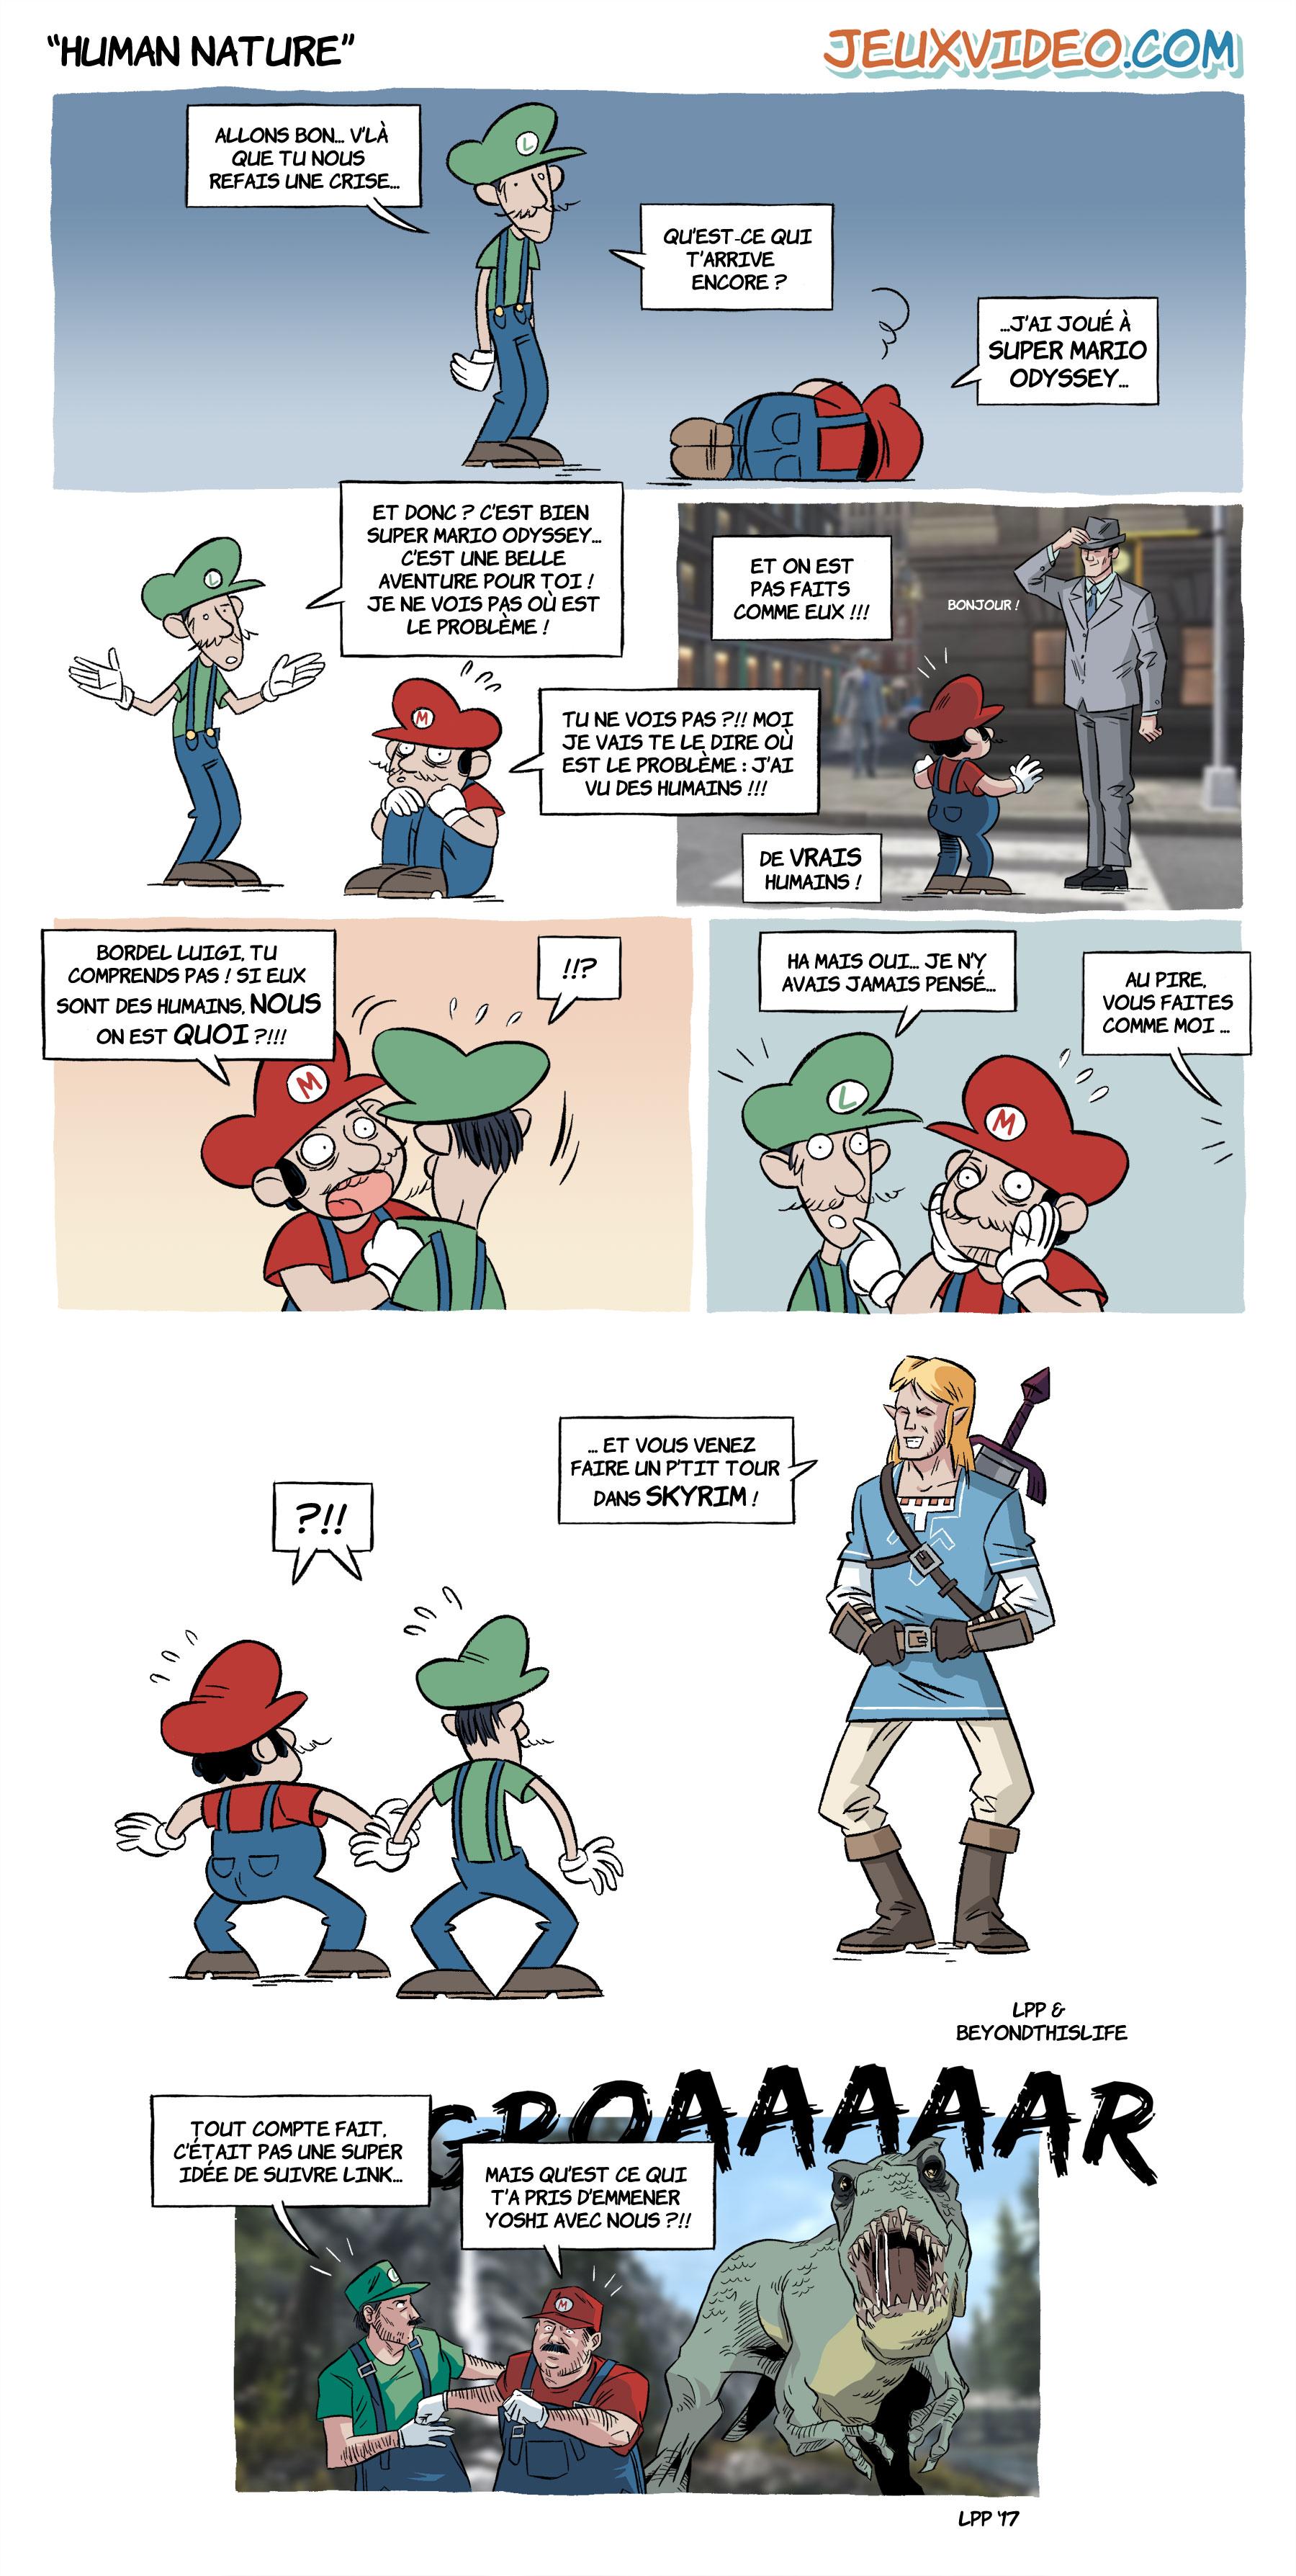 Le topic de l'humour - Page 25 1498205010-6599-artwork